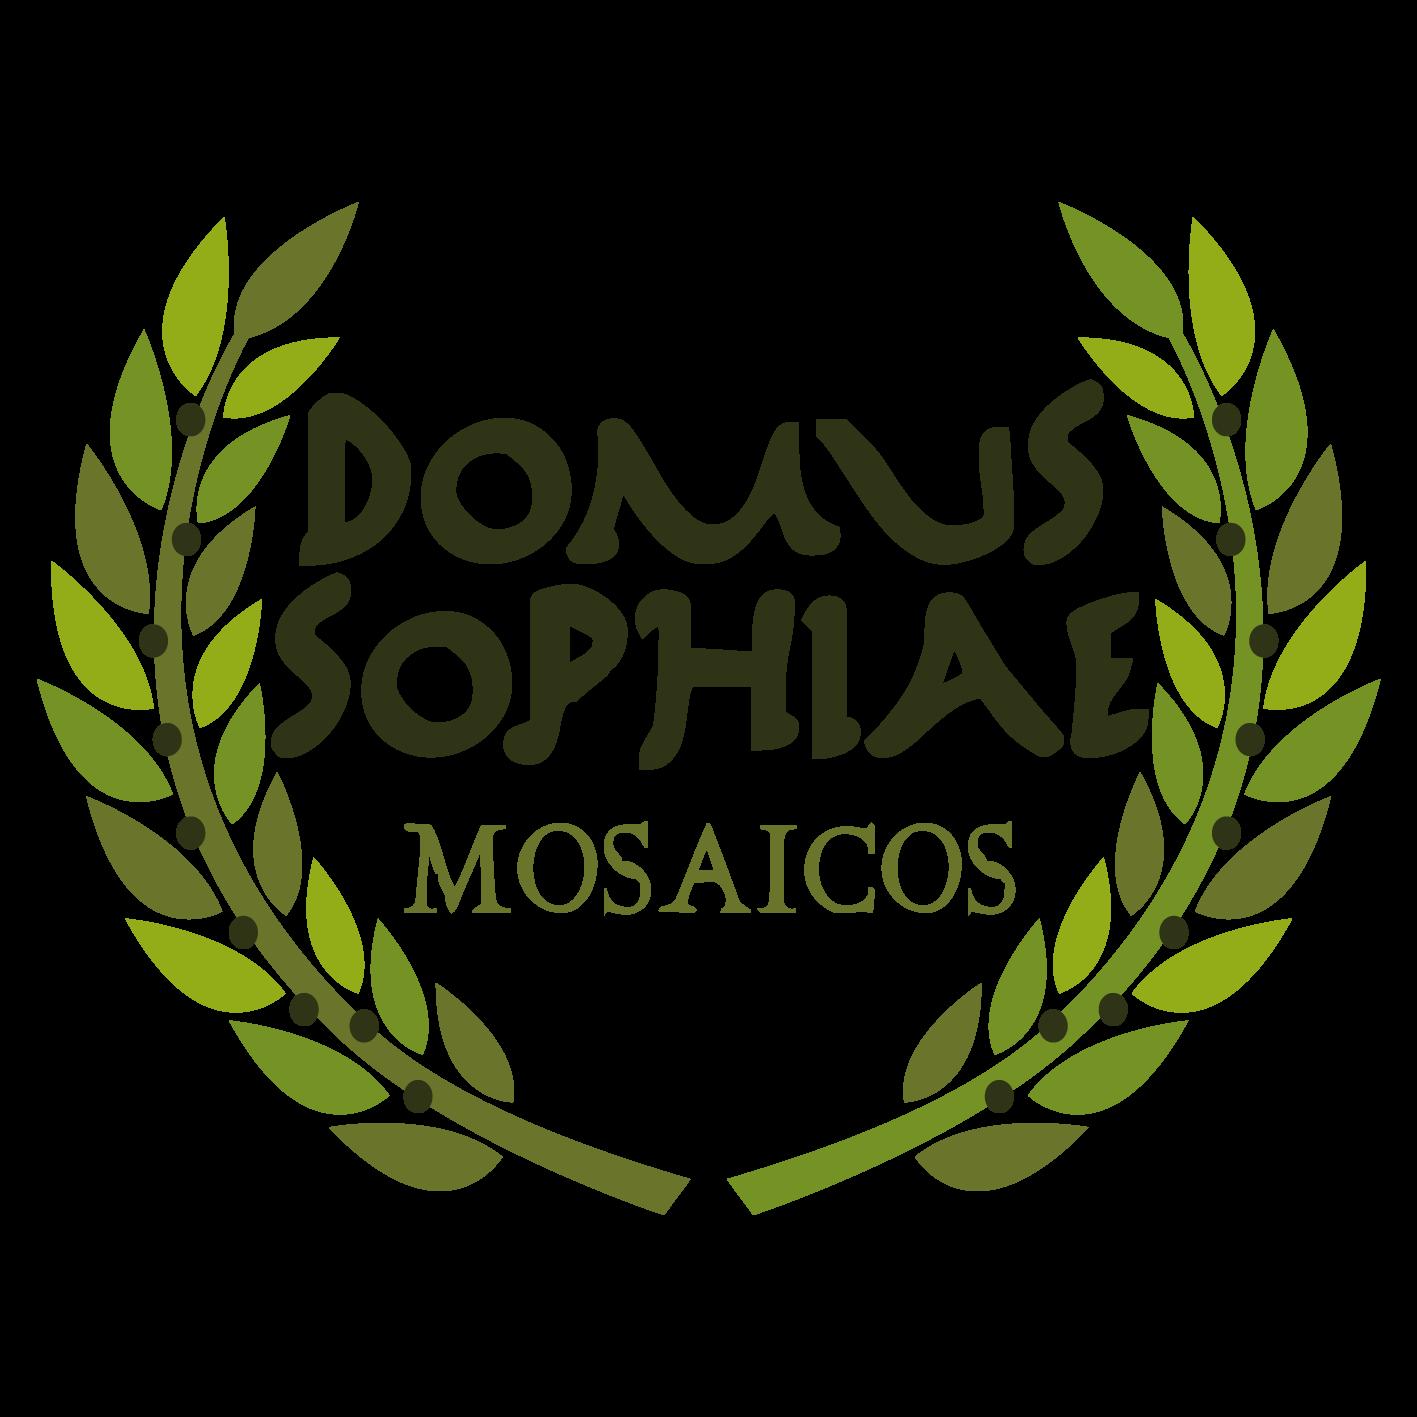 Domus Sophiae